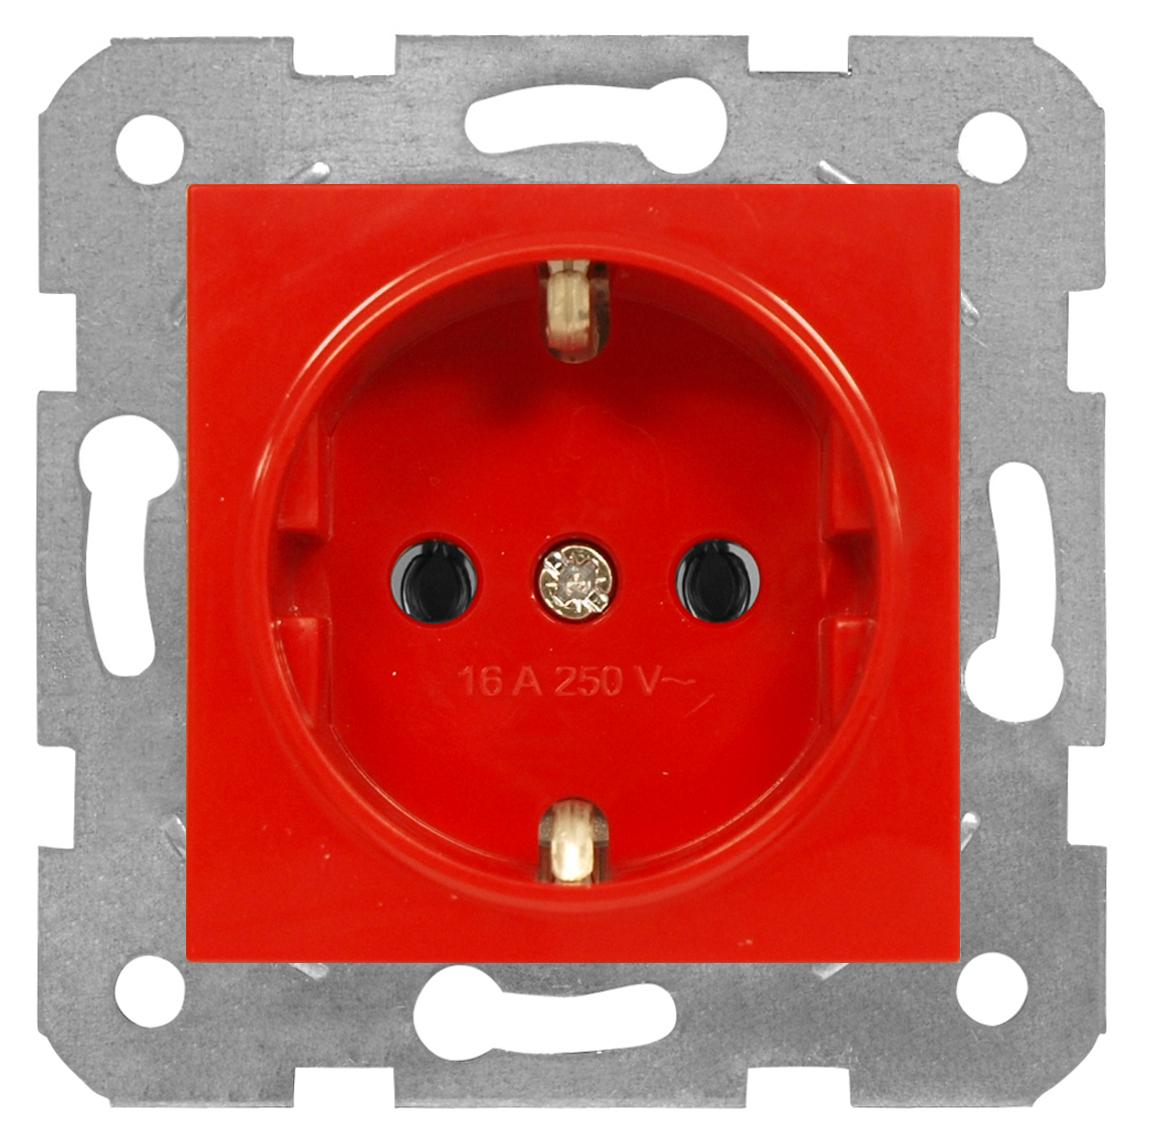 1 Stk Steckdose, rot, Schraubklemmen EV101008--